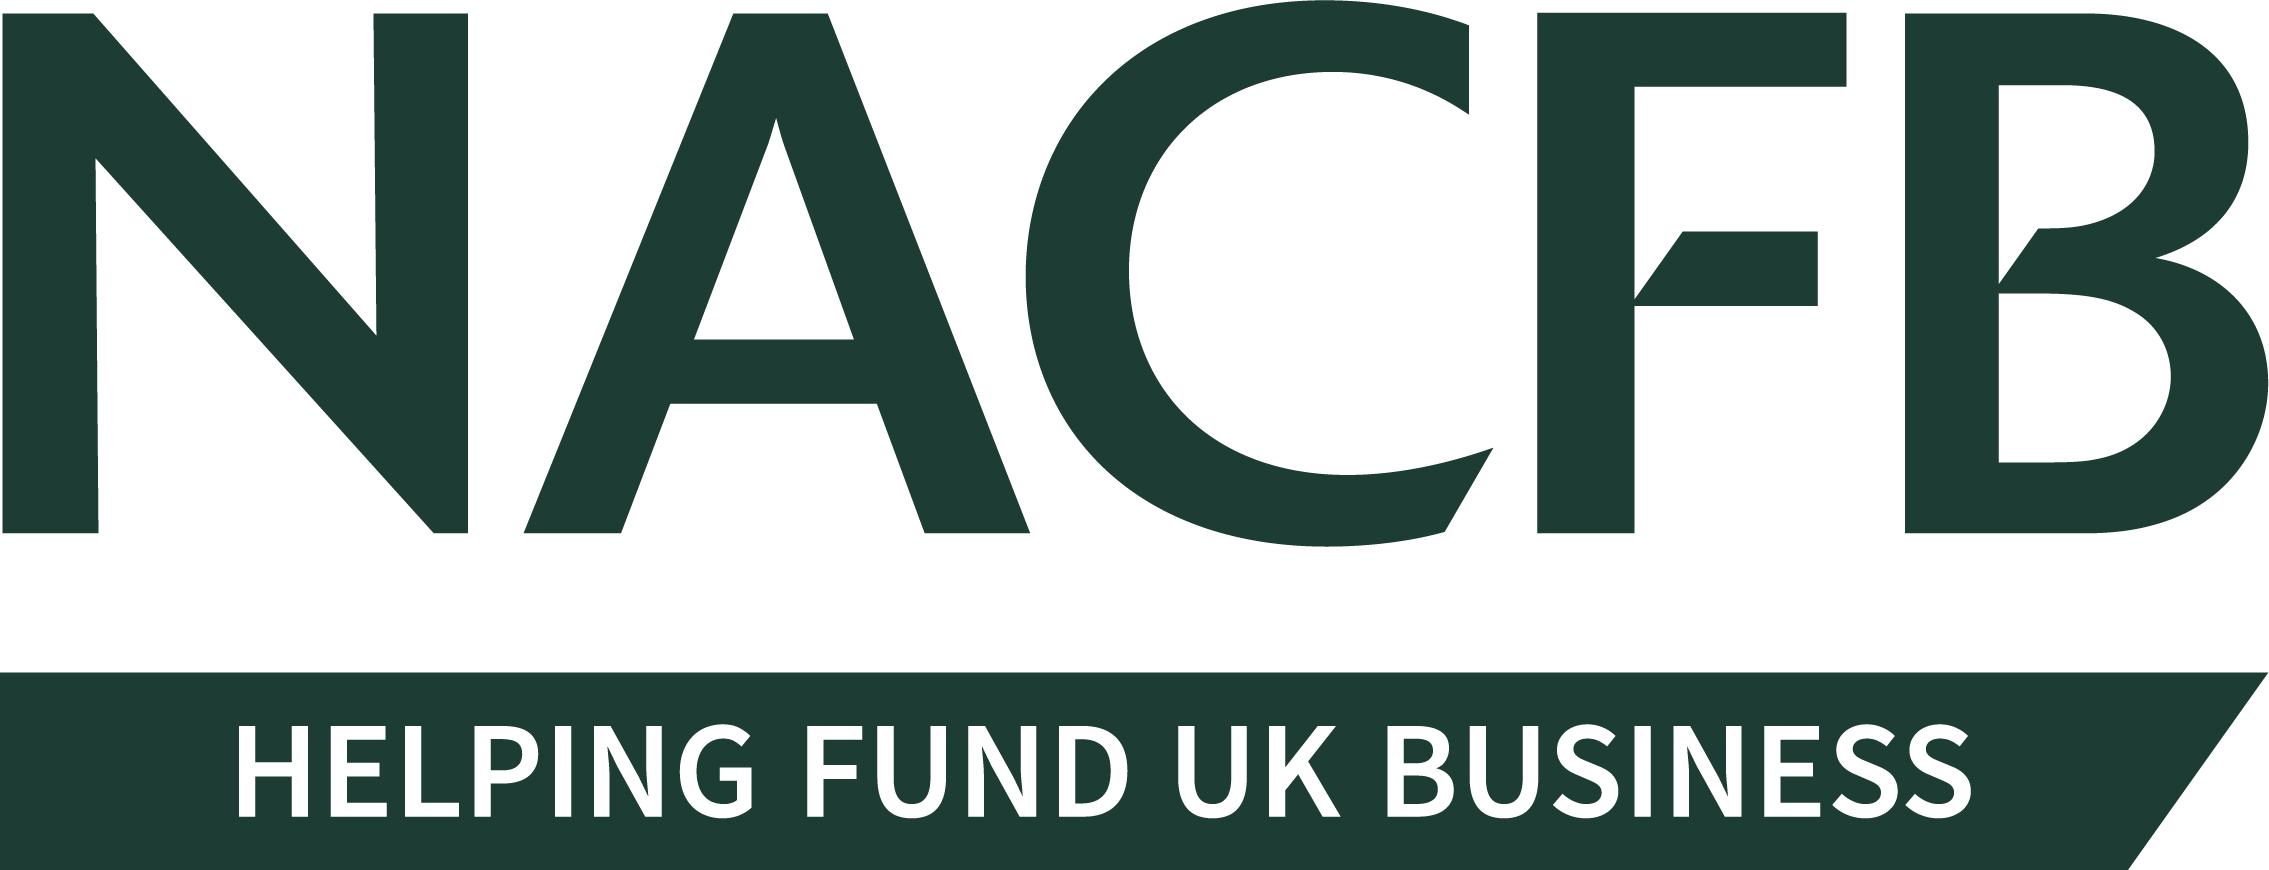 http://lawsonfinancial.co.uk/wp-content/uploads/2020/06/NACFB_Logo_with_strapline_RGB.jpg